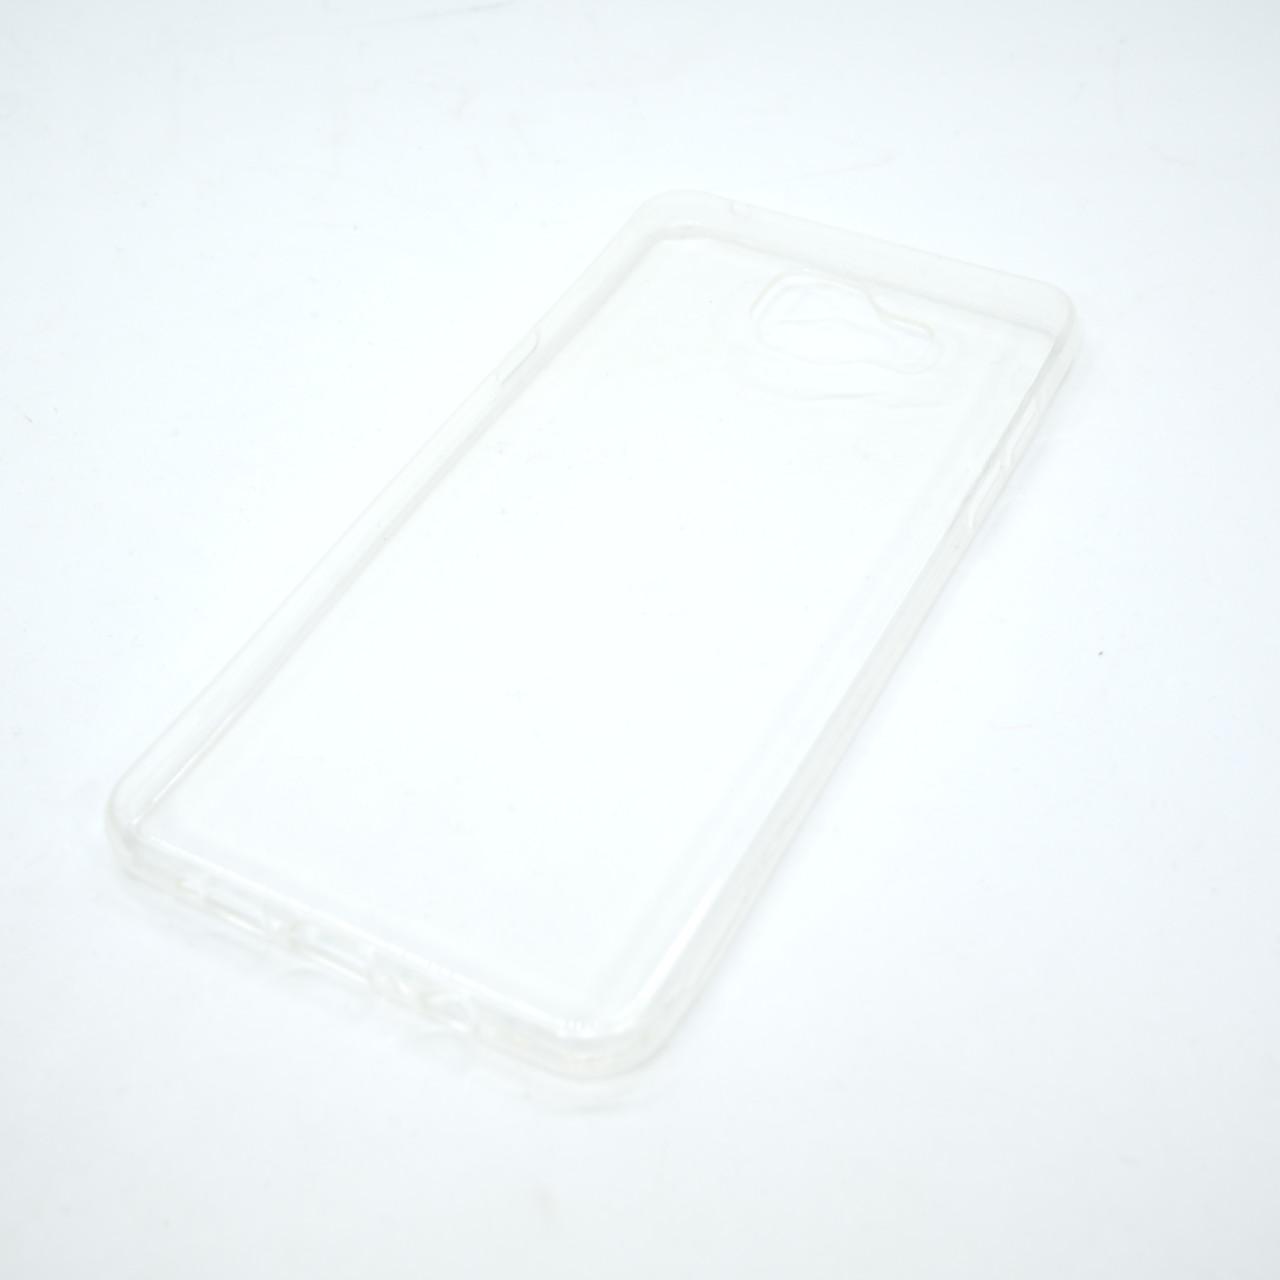 Чехол TPU Ultrathin 0.33mm Samsung Galaxy A5 A500hsof